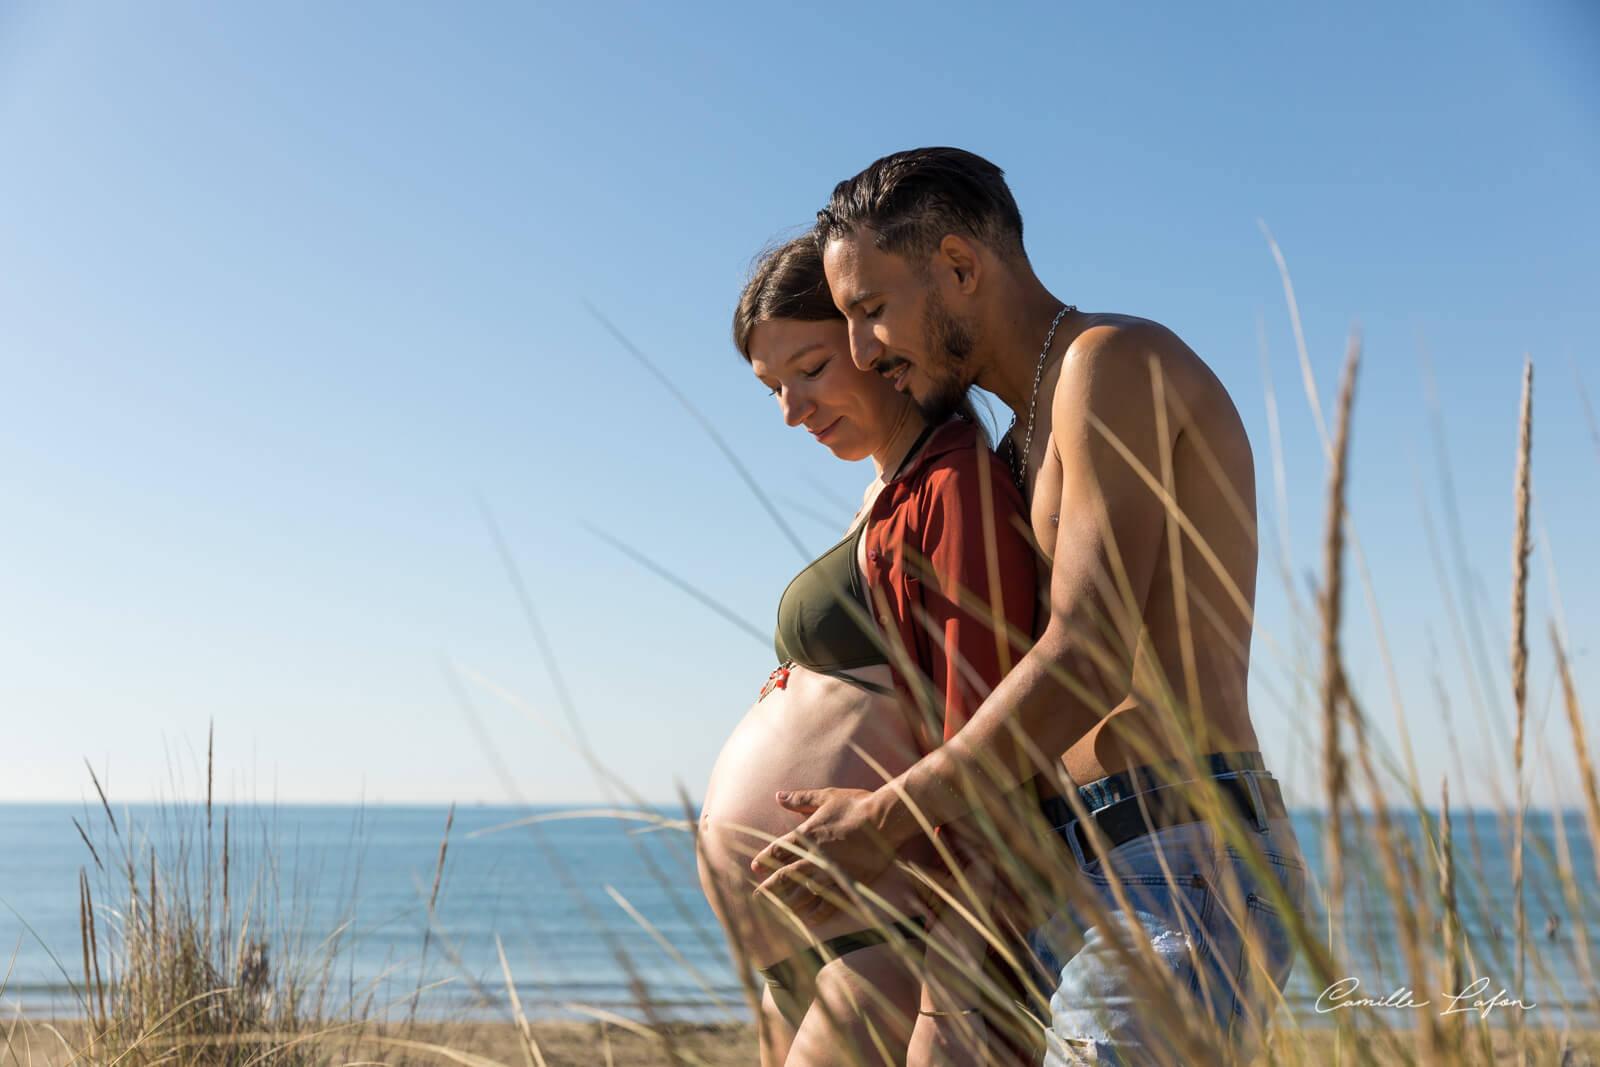 photographe montpellier grossesse mariage famille portrait